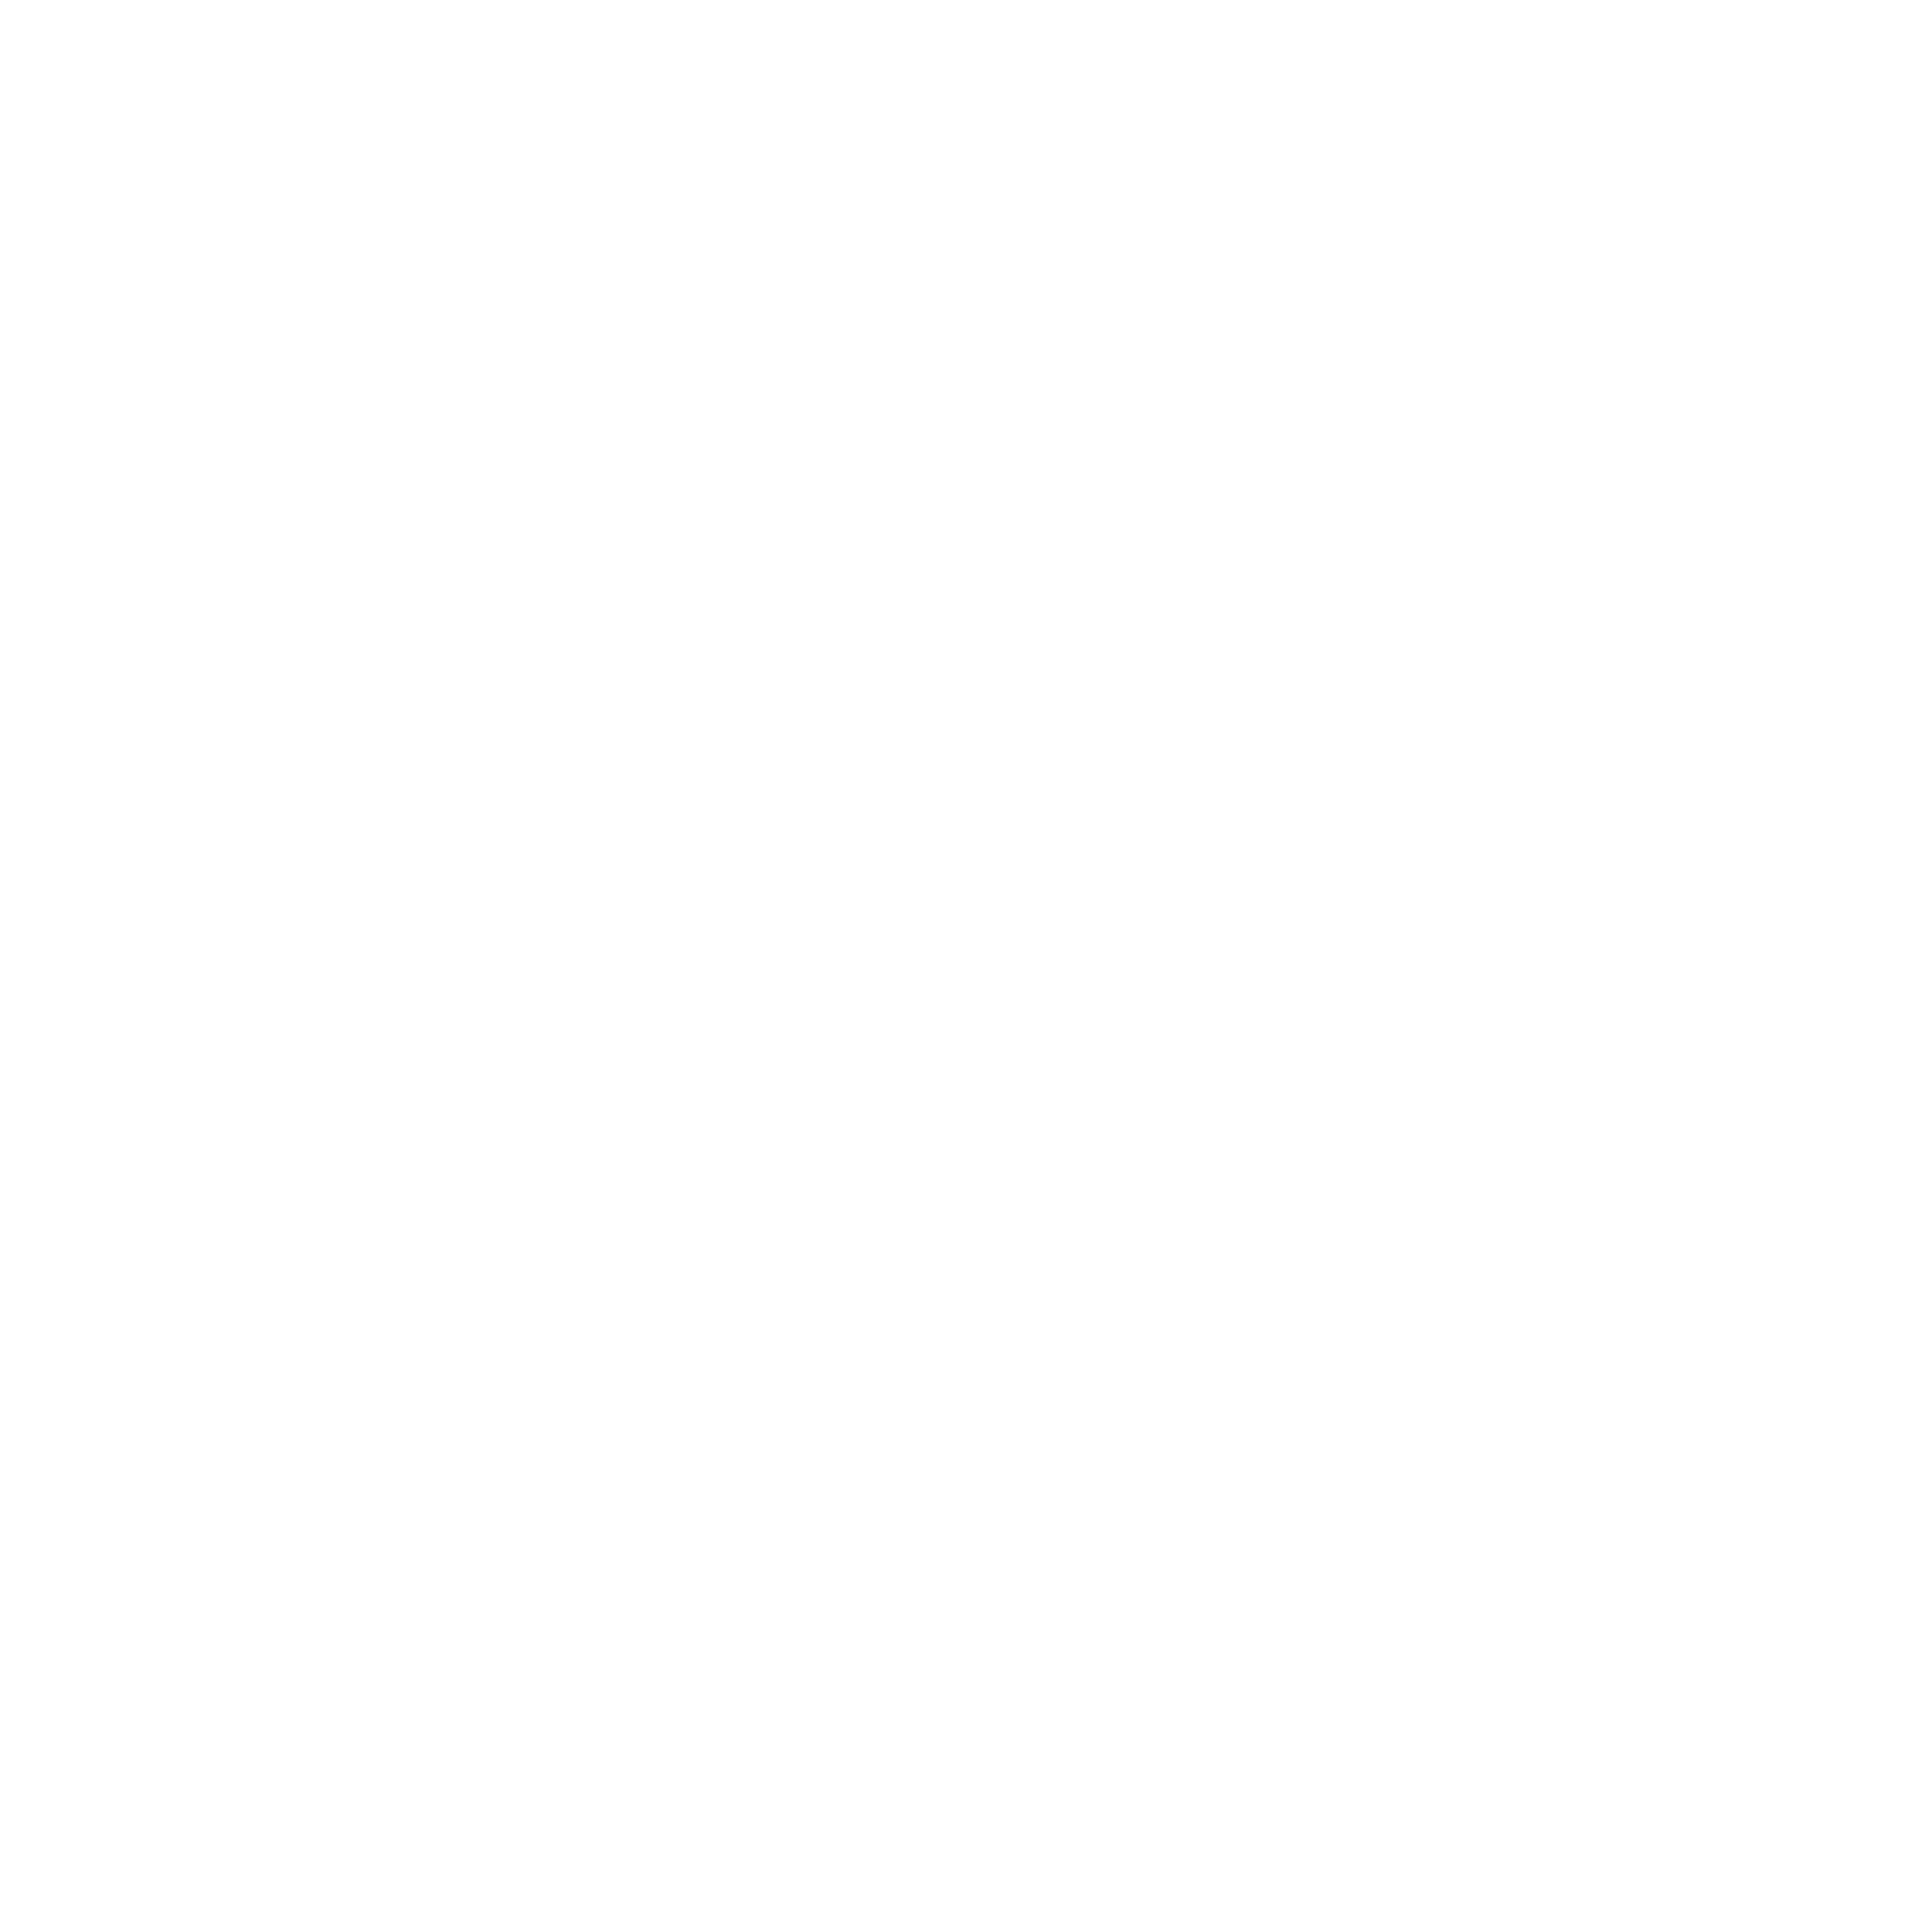 Graphiste - Studio graphique